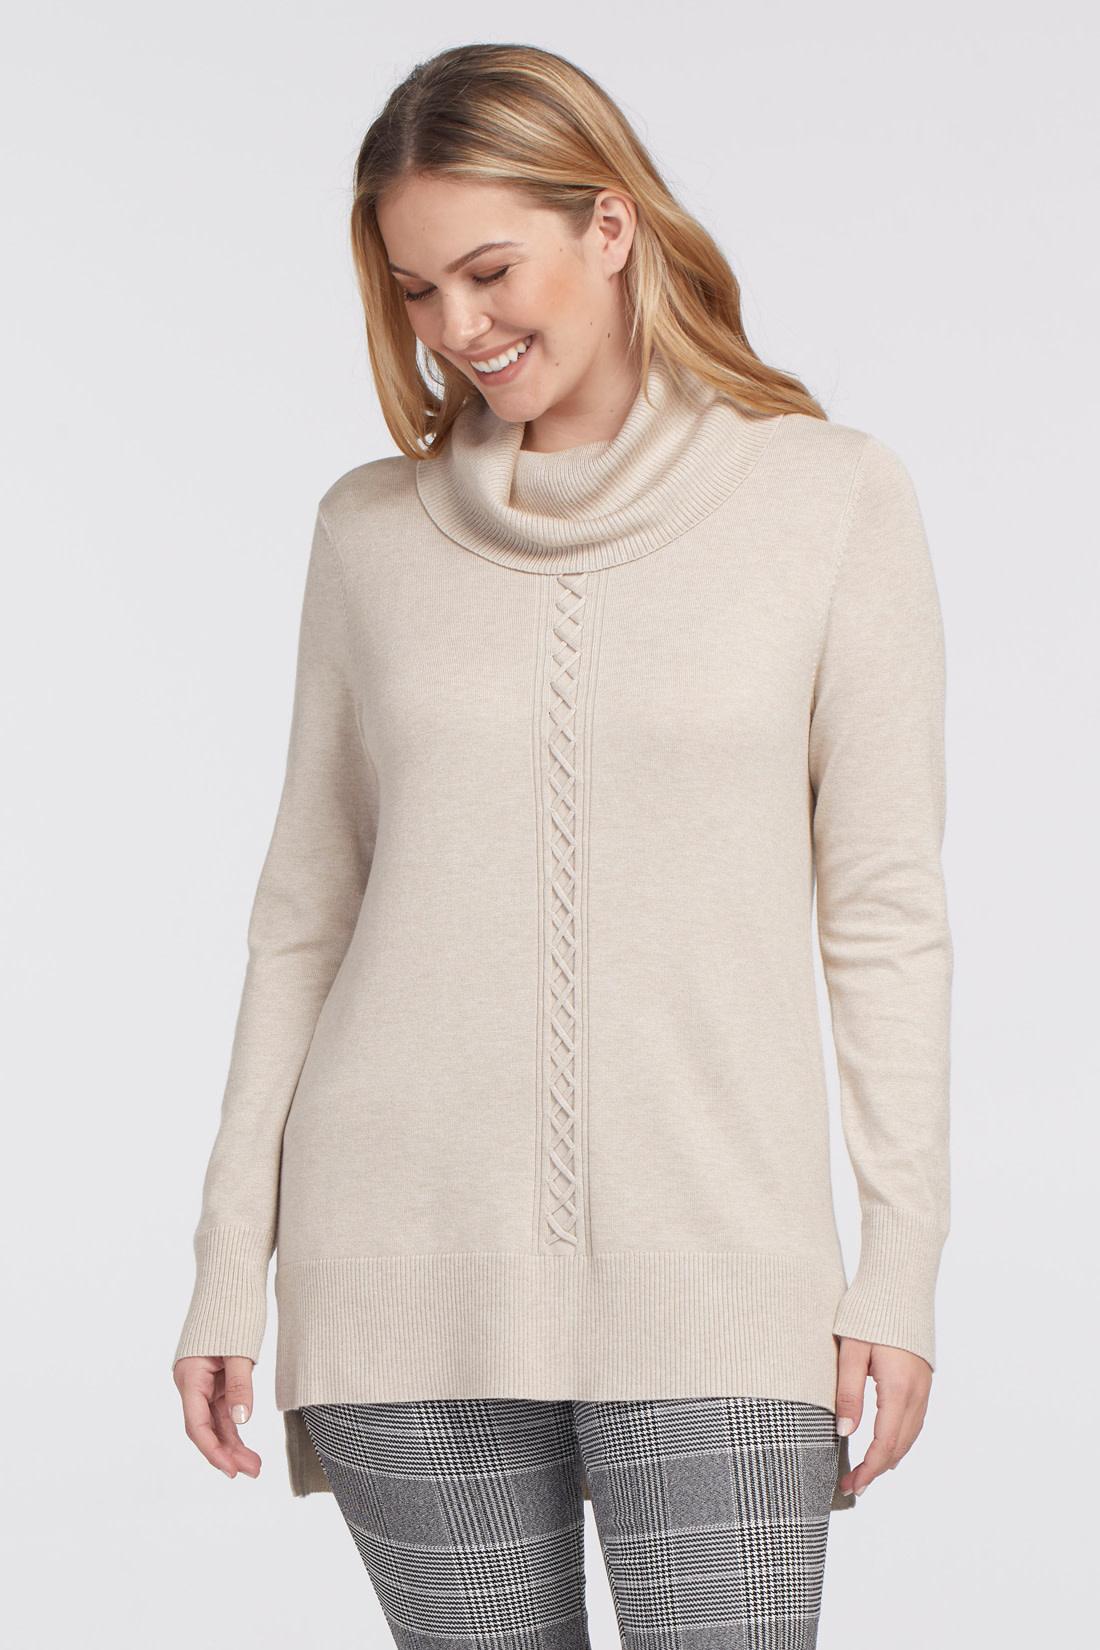 Light Mocha Cowl Neck Sweater